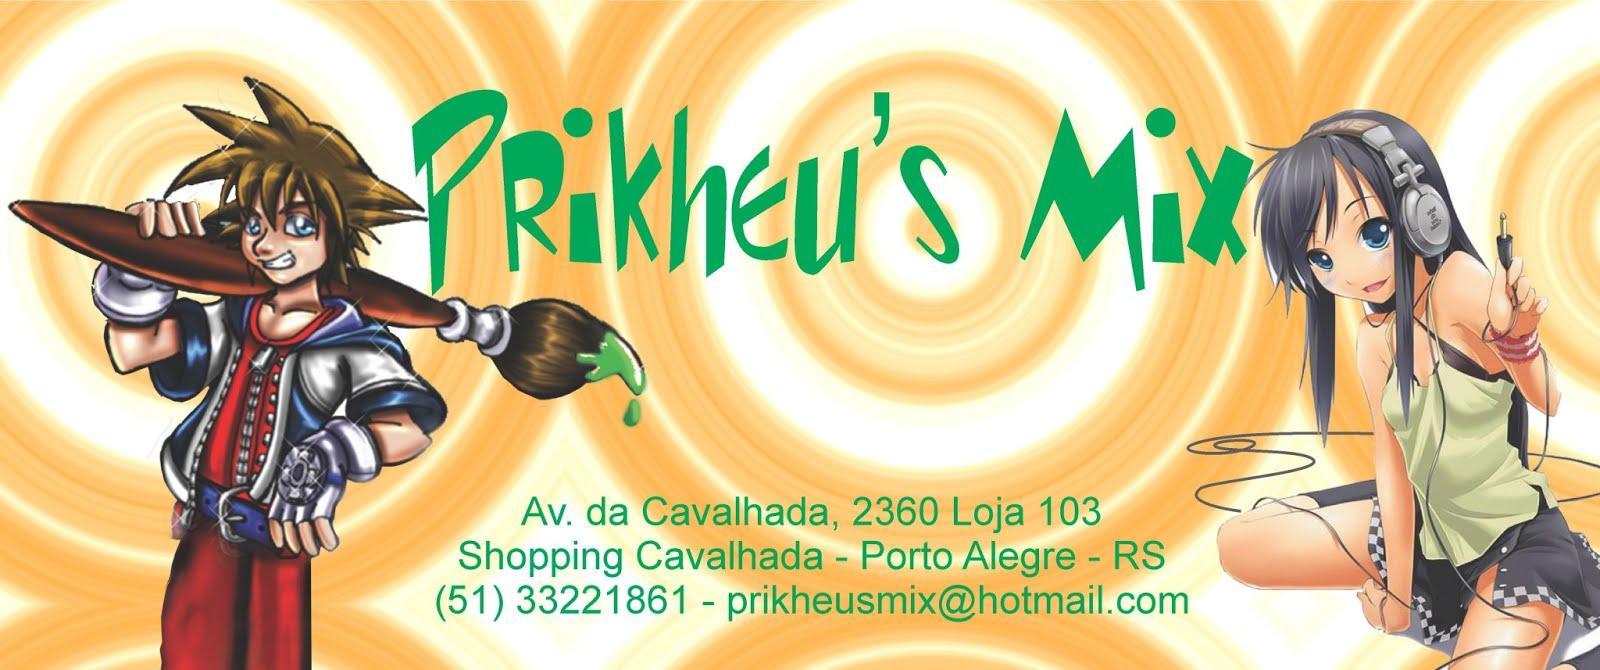 ( Prikheu's Mix )